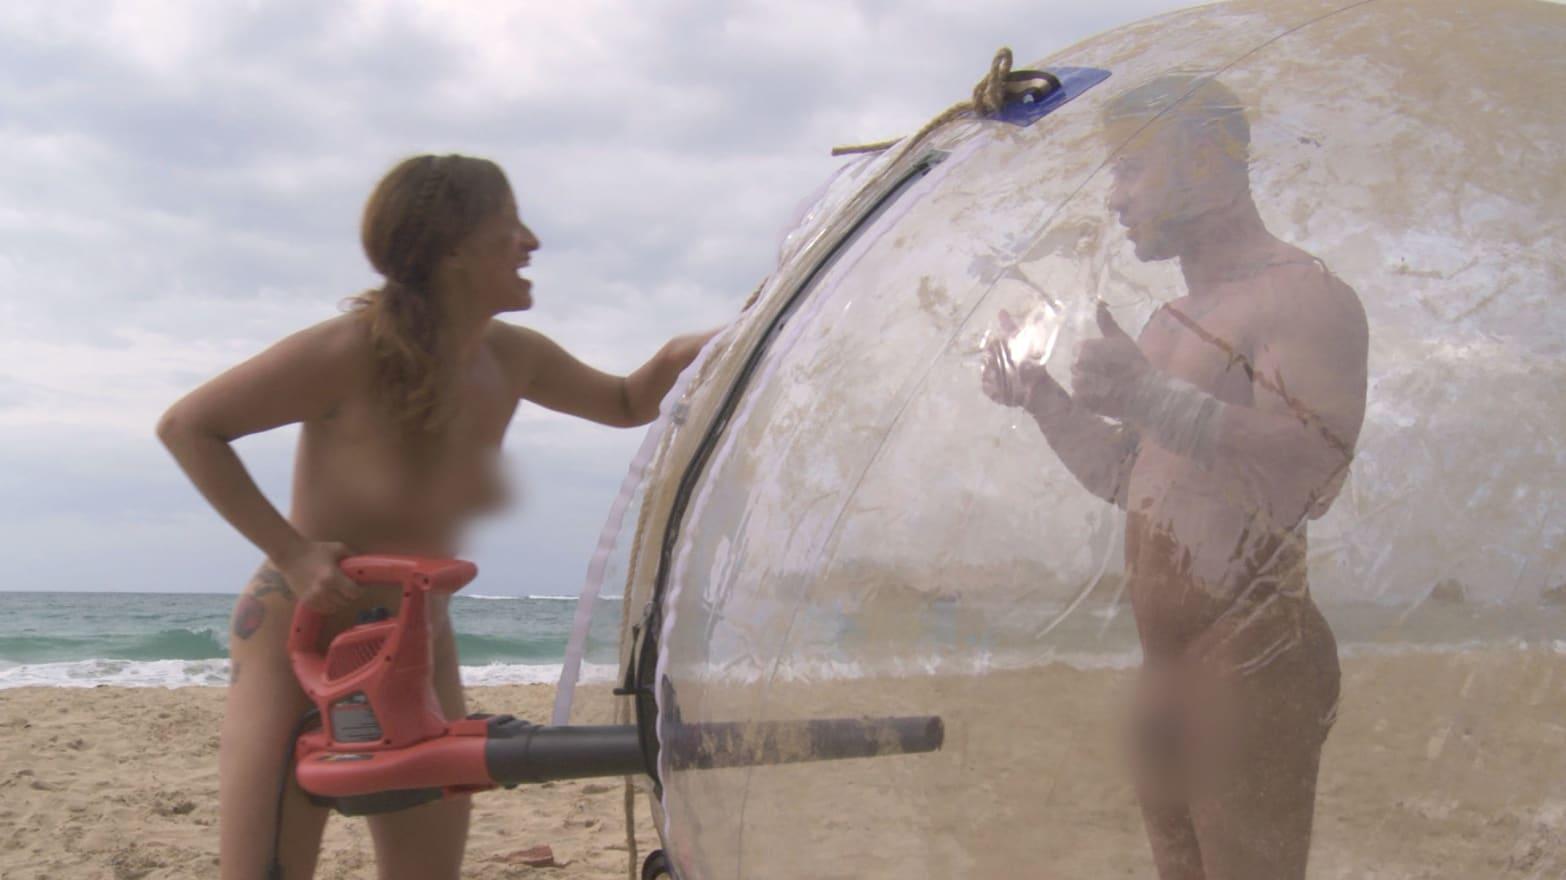 have missed the micro bikini boat accept. opinion, interesting question